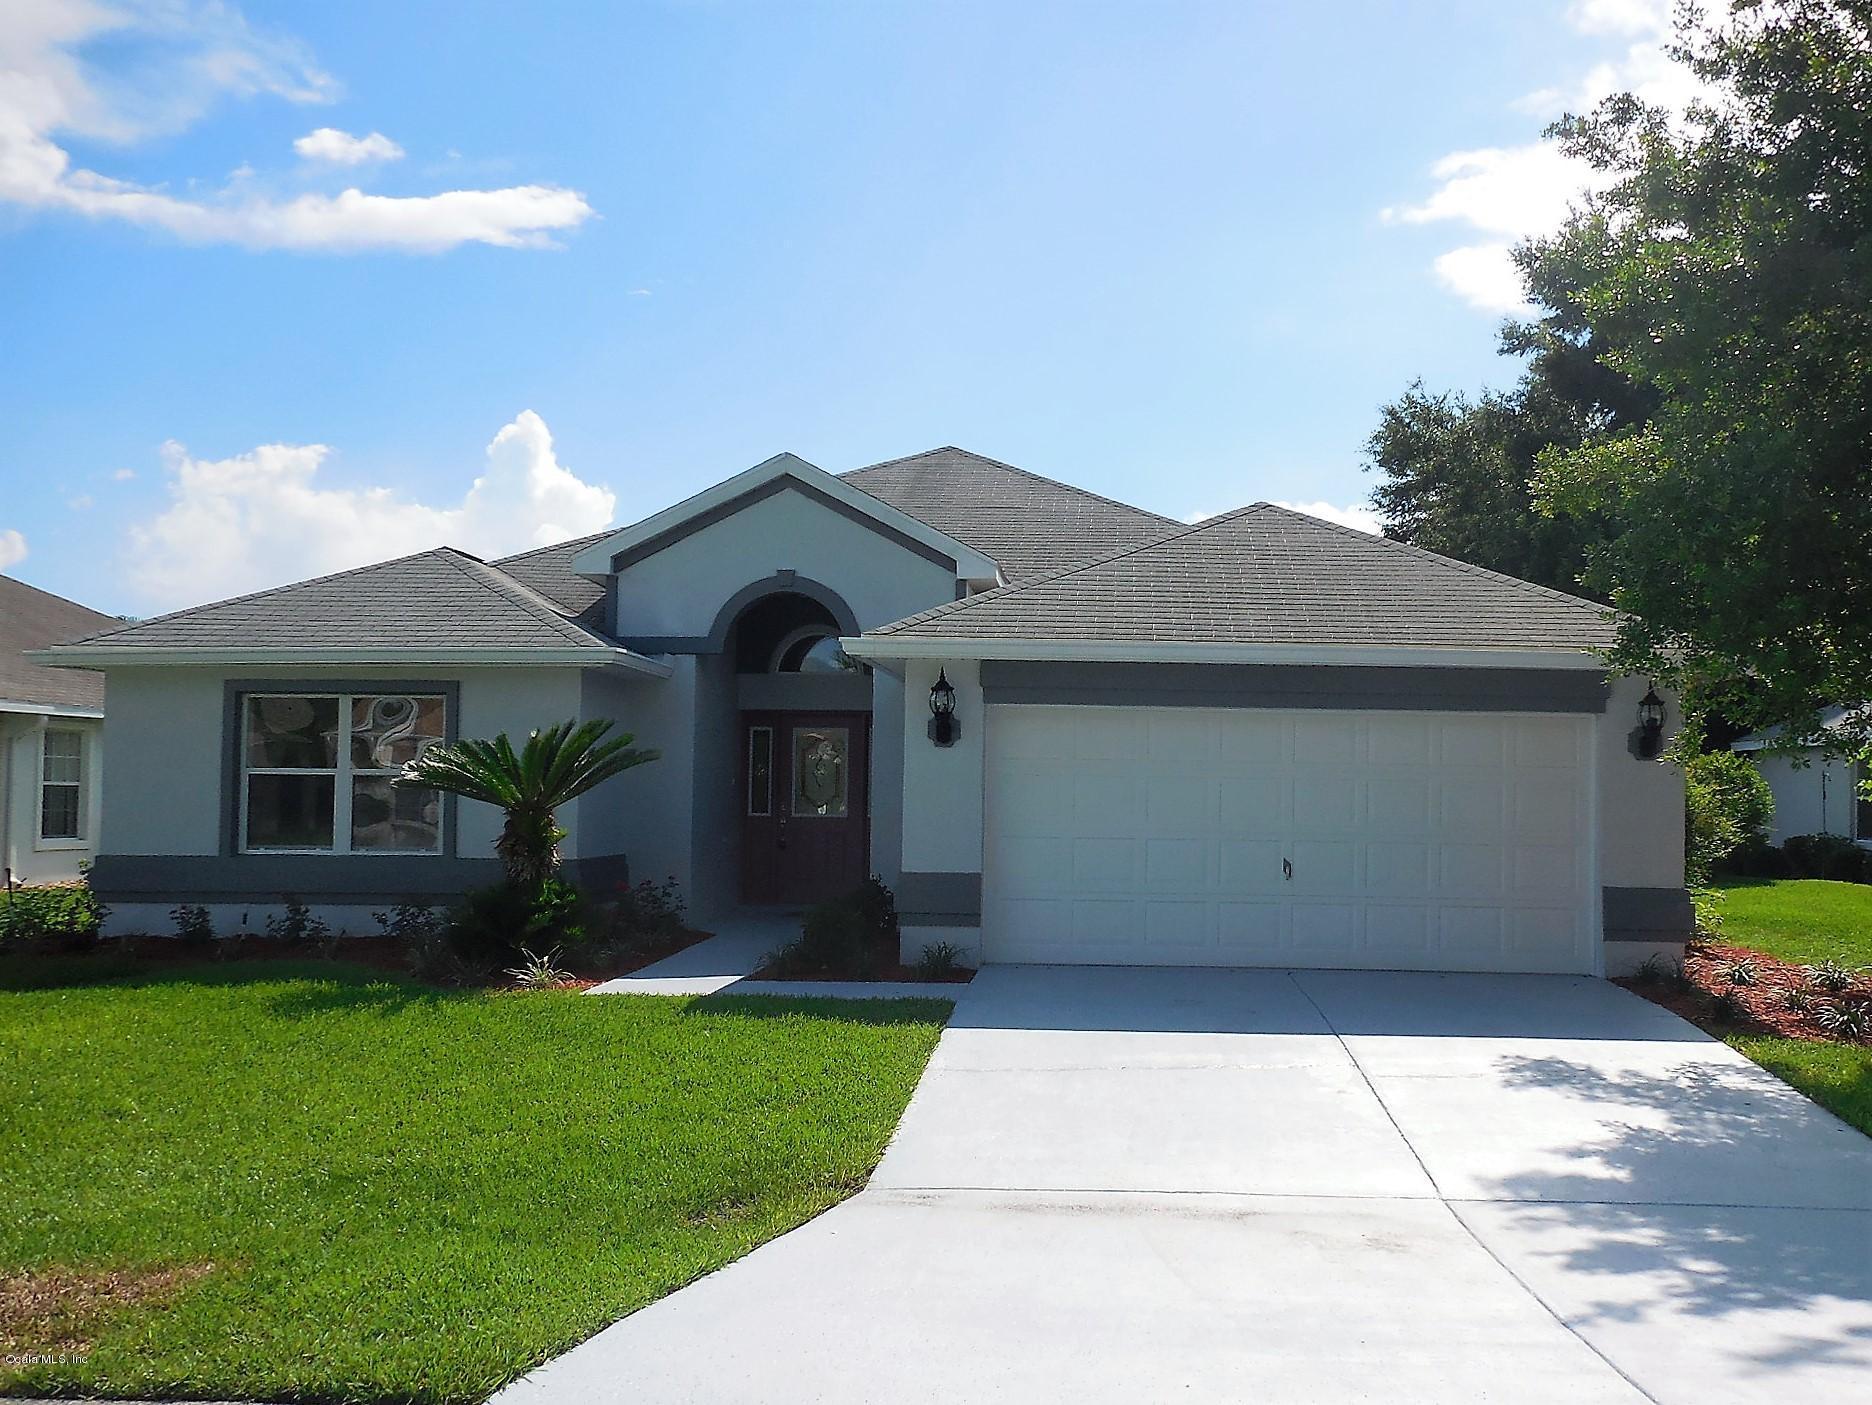 6780 SW 114TH STREET ROAD, OCALA, FL 34476